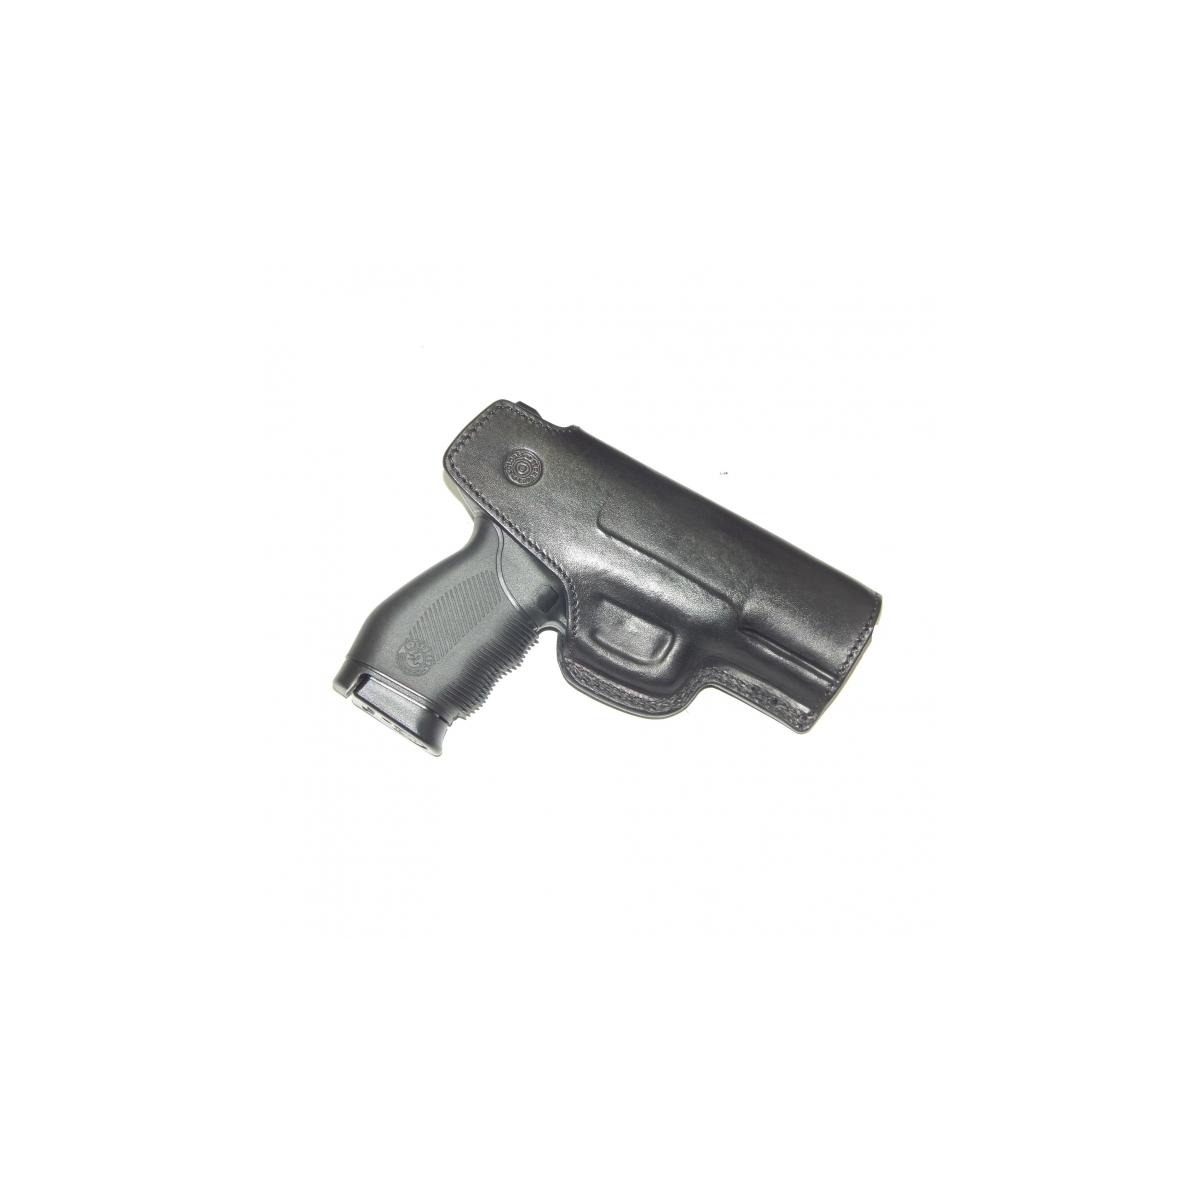 Coldre de Couro Velado Pistola Taurus 24/7